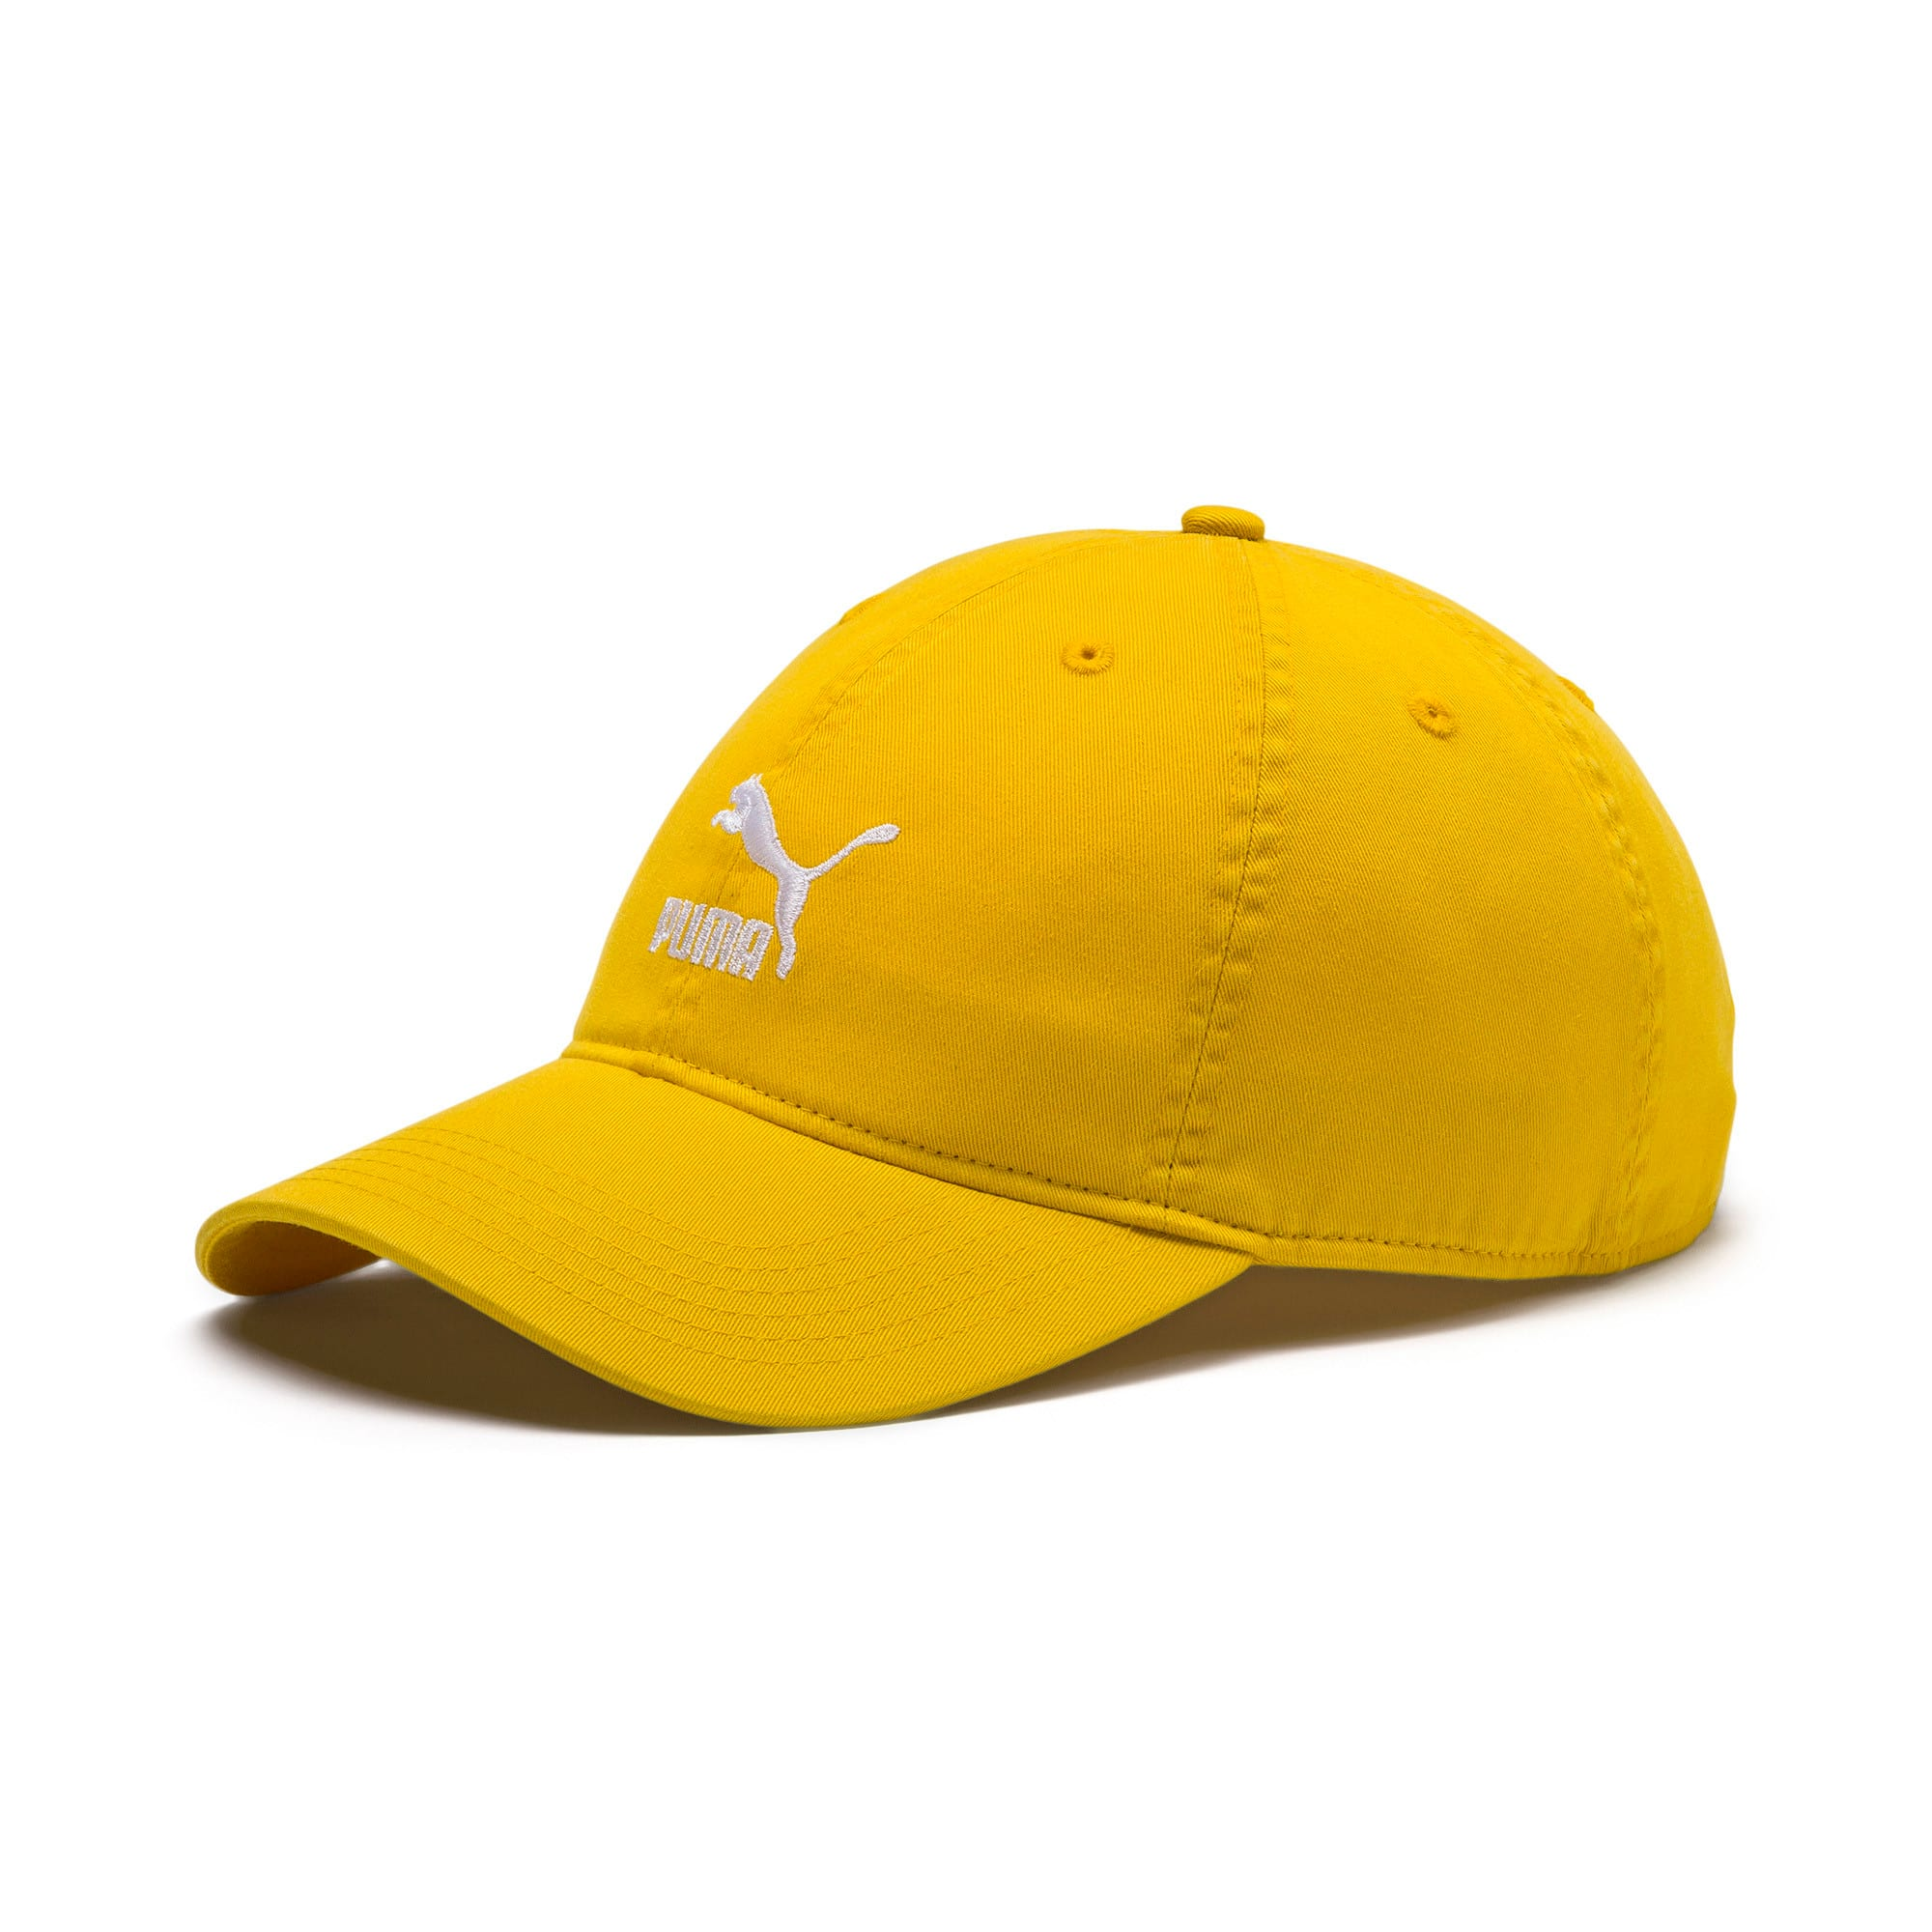 Thumbnail 1 of ARCHIVE BB cap, Sulphur, medium